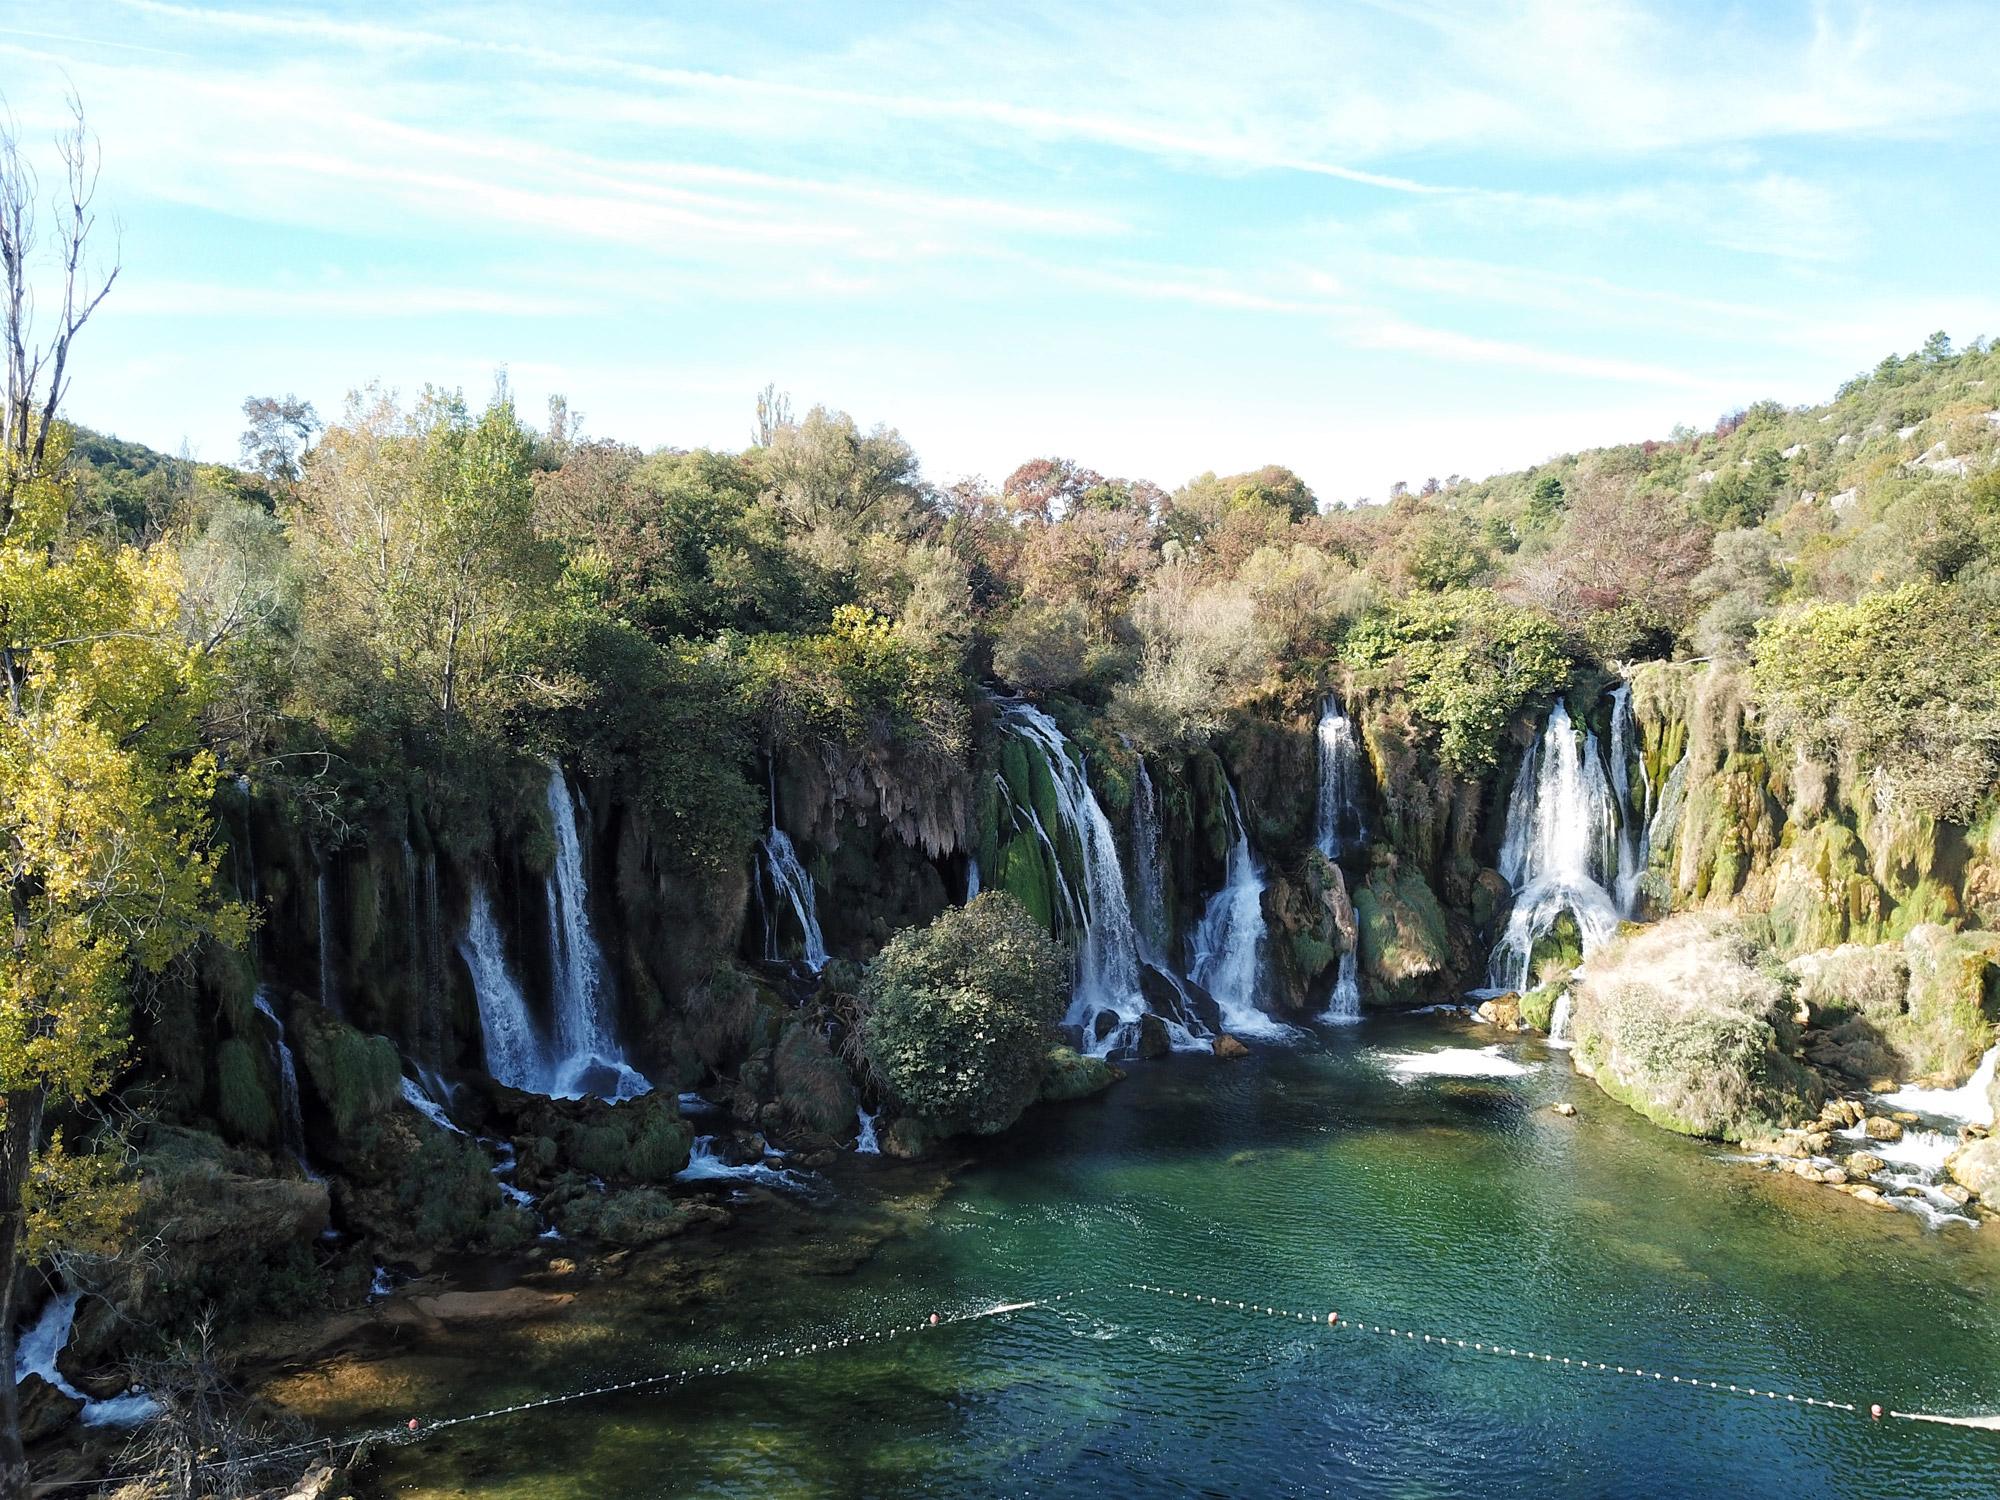 Bosnië & Herzegovina - Kravica watervallen